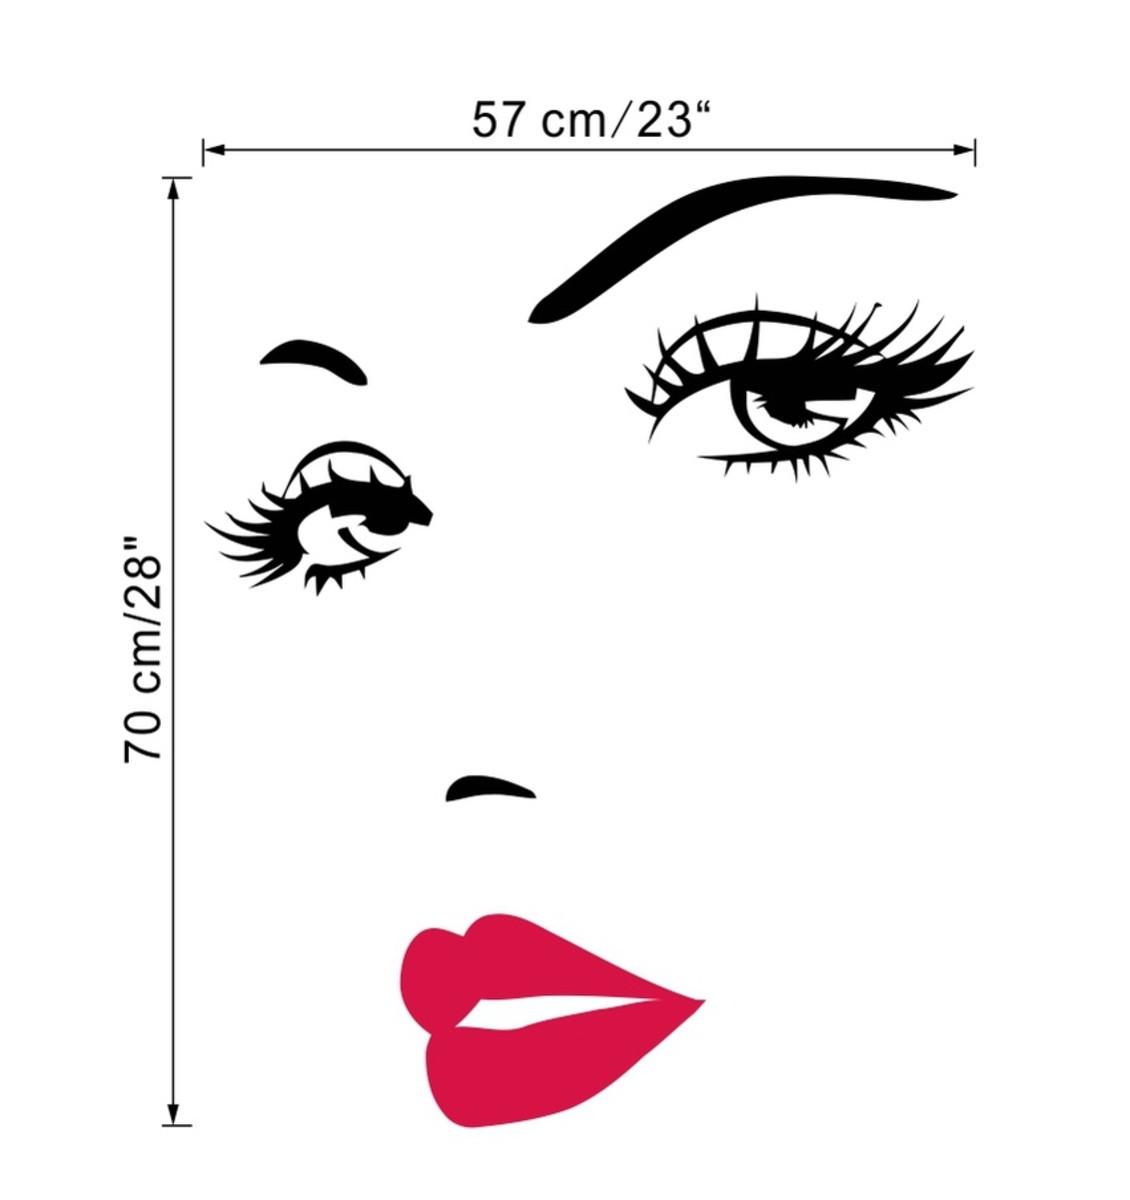 Adesivo Para Salao De Beleza Rosto Mulher Personalizado No Elo7